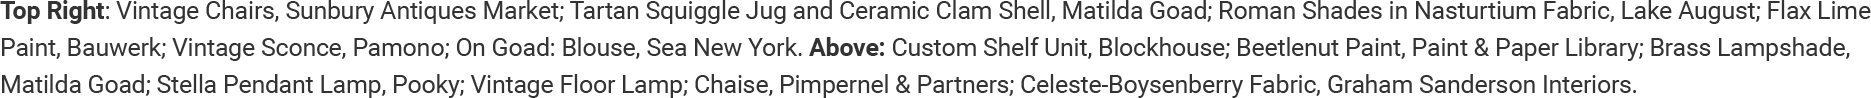 Top Right: Vintage Chairs, Sunbury Antiques Market; Tartan Squiggle Jug and Ceramic Clam Shell, Matilda Goad; Roman Shades in Nasturtium Fabric, Lake August; Flax Lime Paint, Bauwerk; Vintage Sconce, Pamono; On Goad: Blouse, Sea New York. Above: Custom Shelf Unit, Blockhouse; Beetlenut Paint, Paint & Paper Library; Brass Lampshade, Matilda Goad; Stella Pendant Lamp, Pooky; Vintage Floor Lamp; Chaise, Pimpernel & Partners; Celeste-Boysenberry Fabric, Graham Sanderson Interiors.